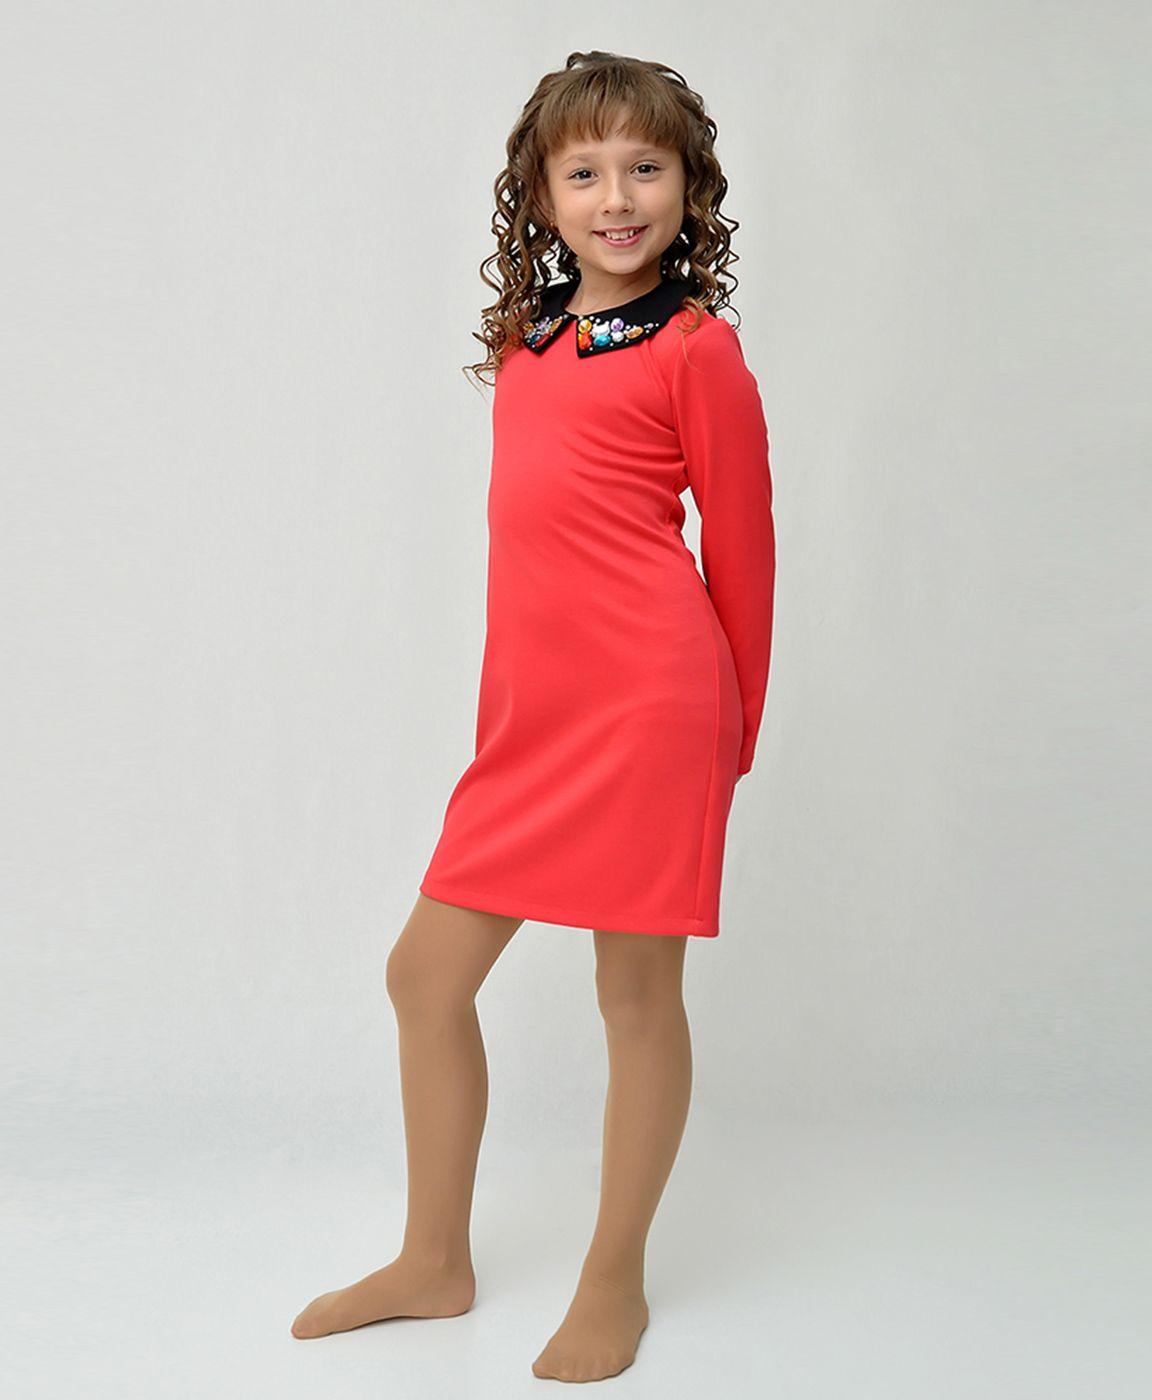 Tween Girl Fashion Black: Épinglé Par Lara Sur Things To Wear